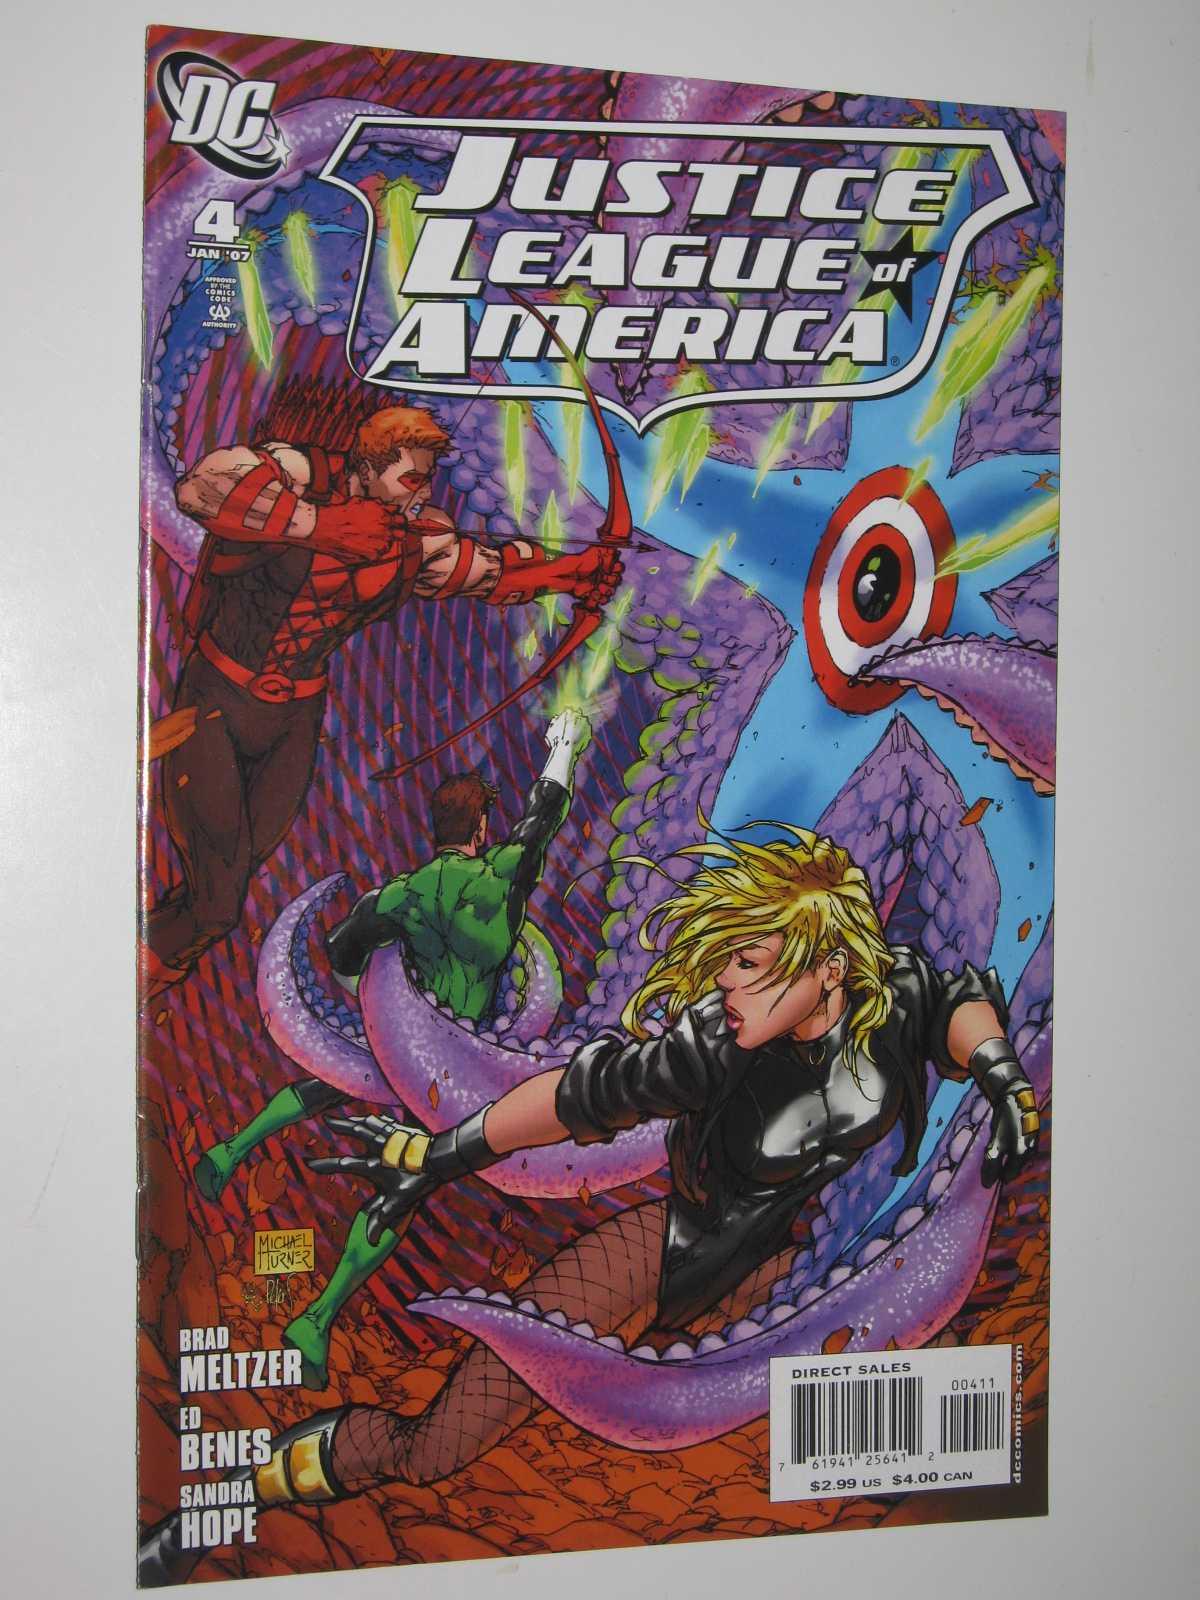 Justice League of America #4 : January 2007, Meltzer, Brad